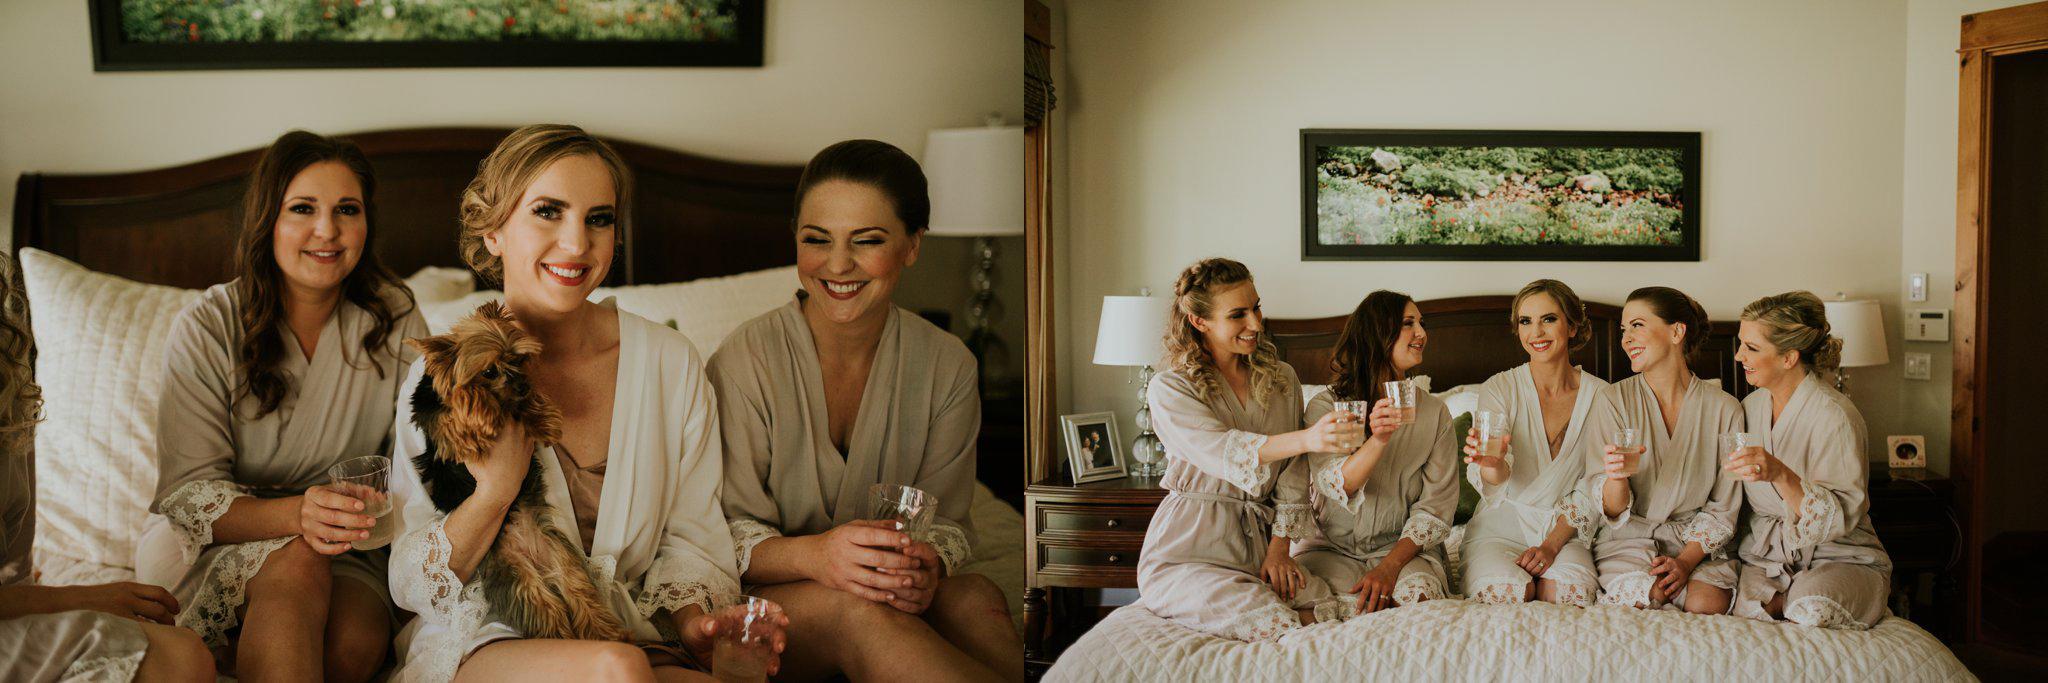 hollywood-school-house-wedding-seattle-photographer-caitlyn-nikula-11.jpg